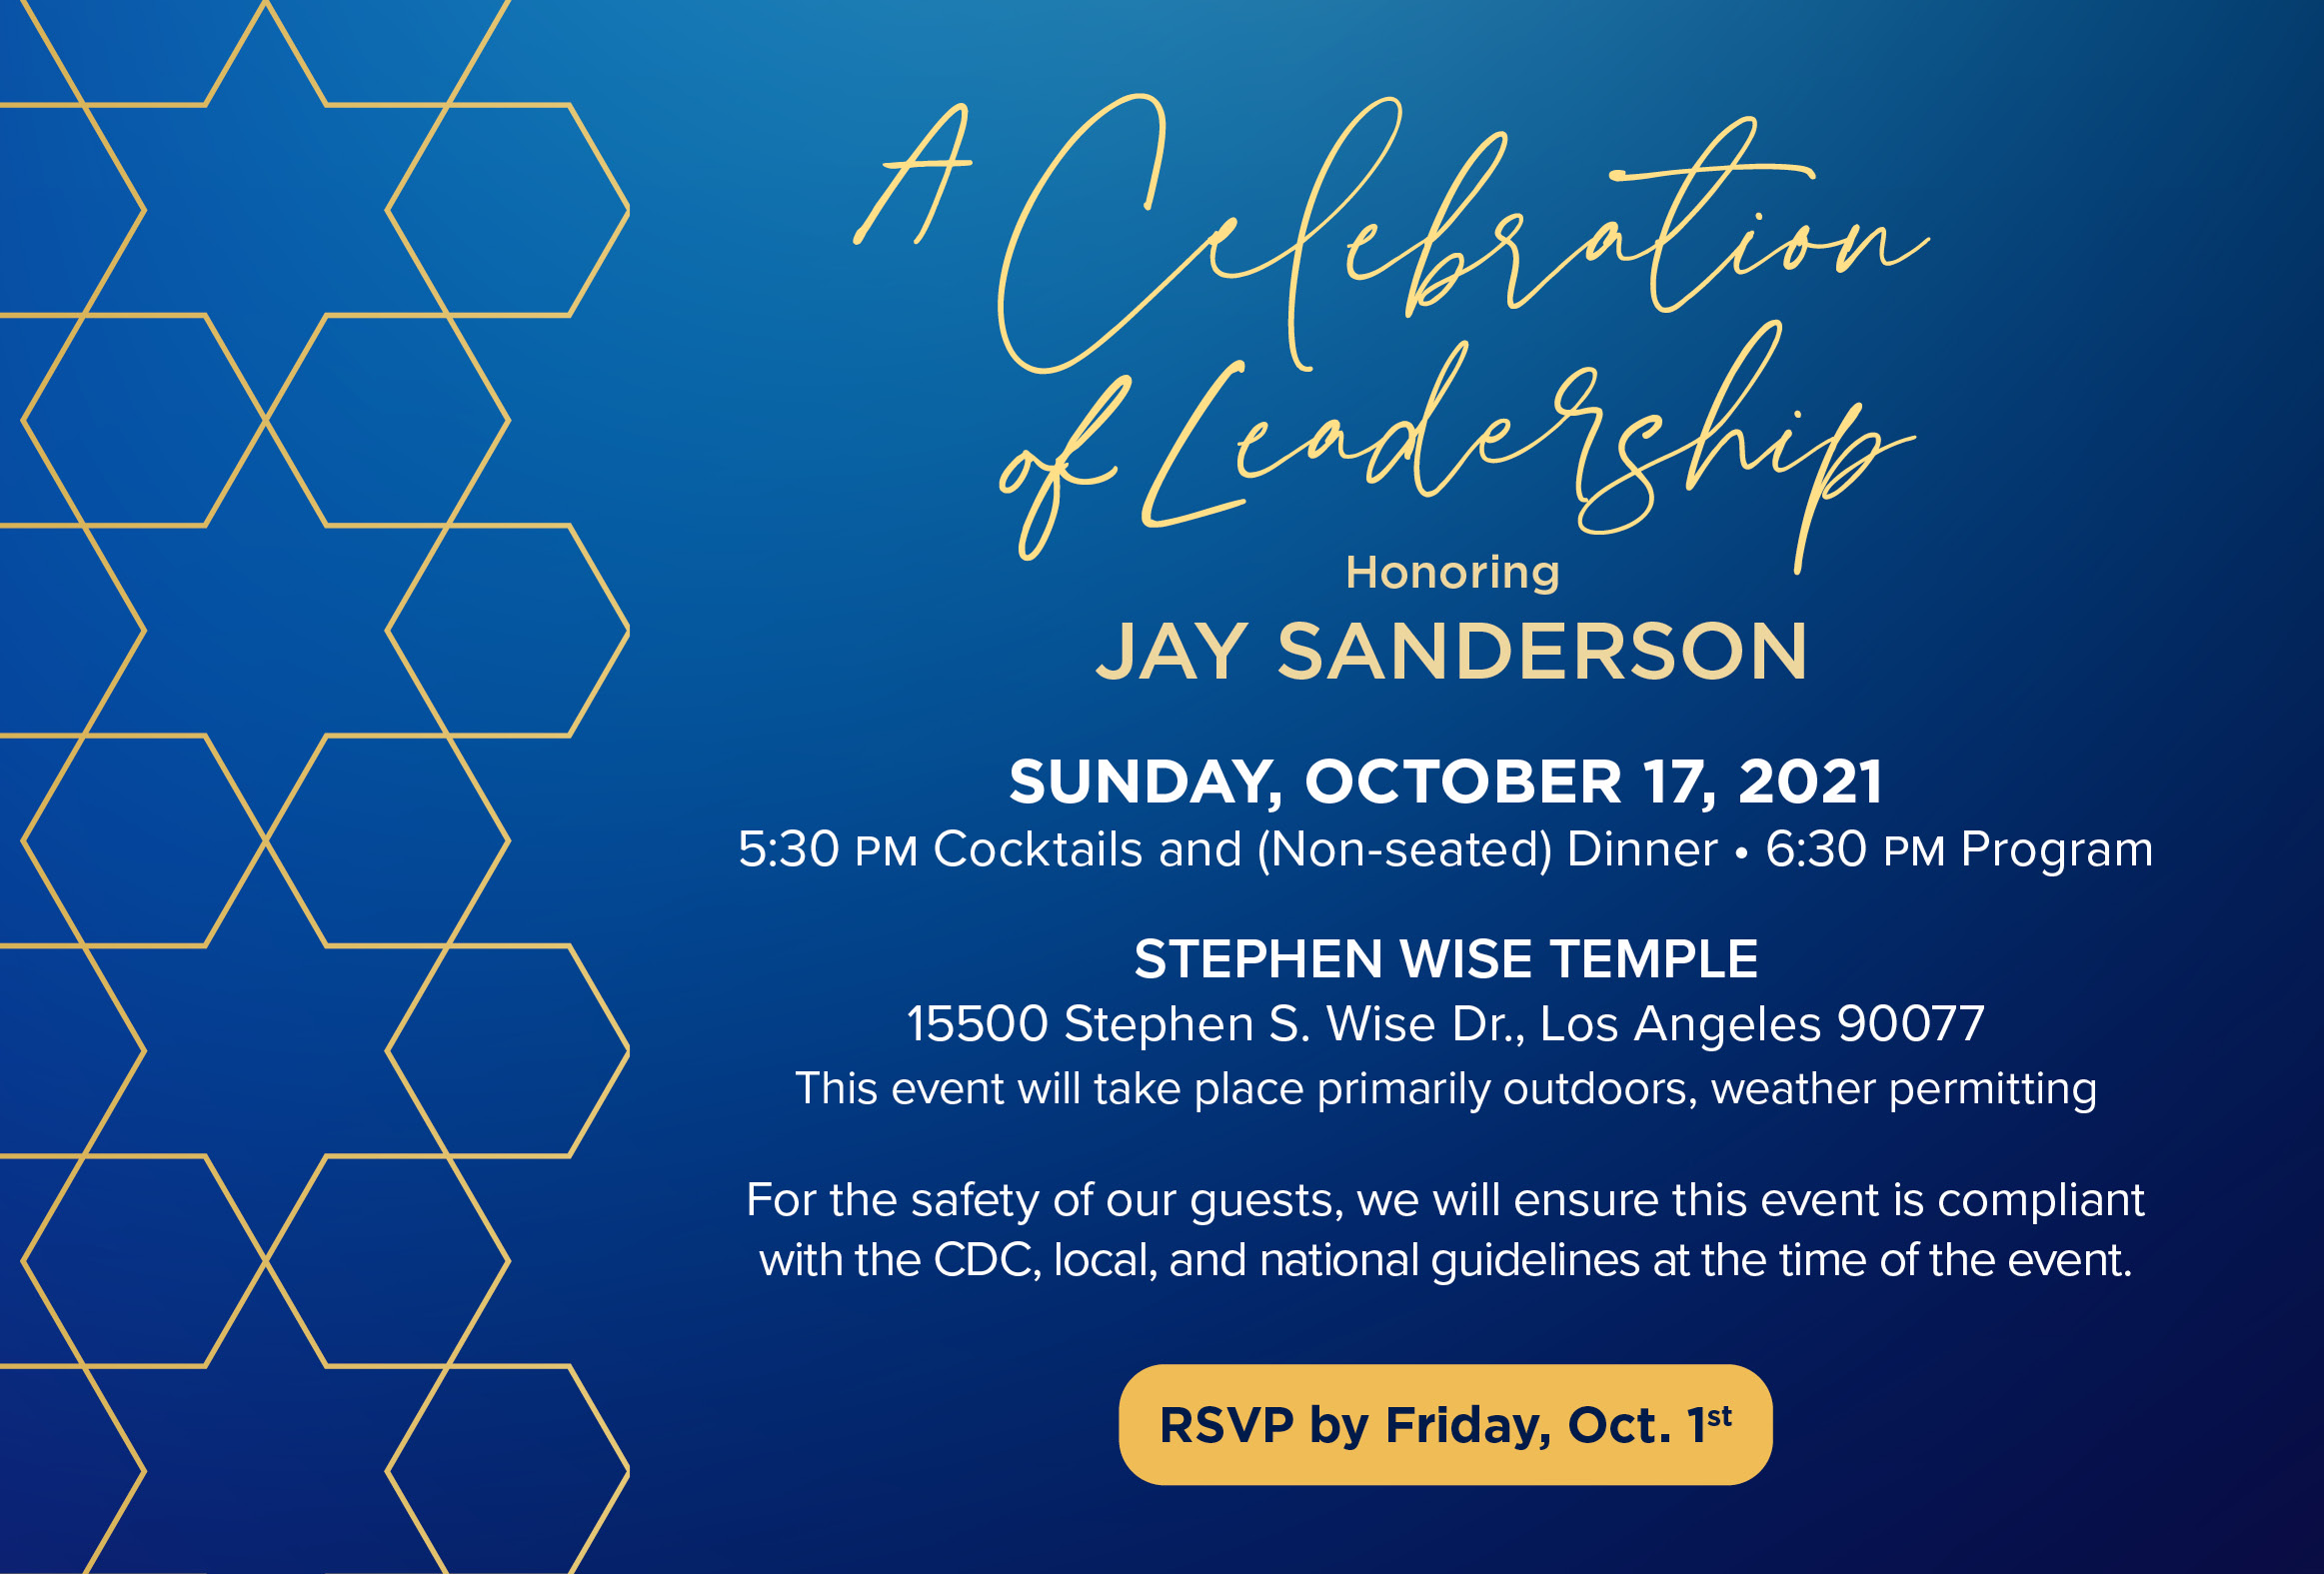 Celebration of Leadership Honoring Jay Sanderson